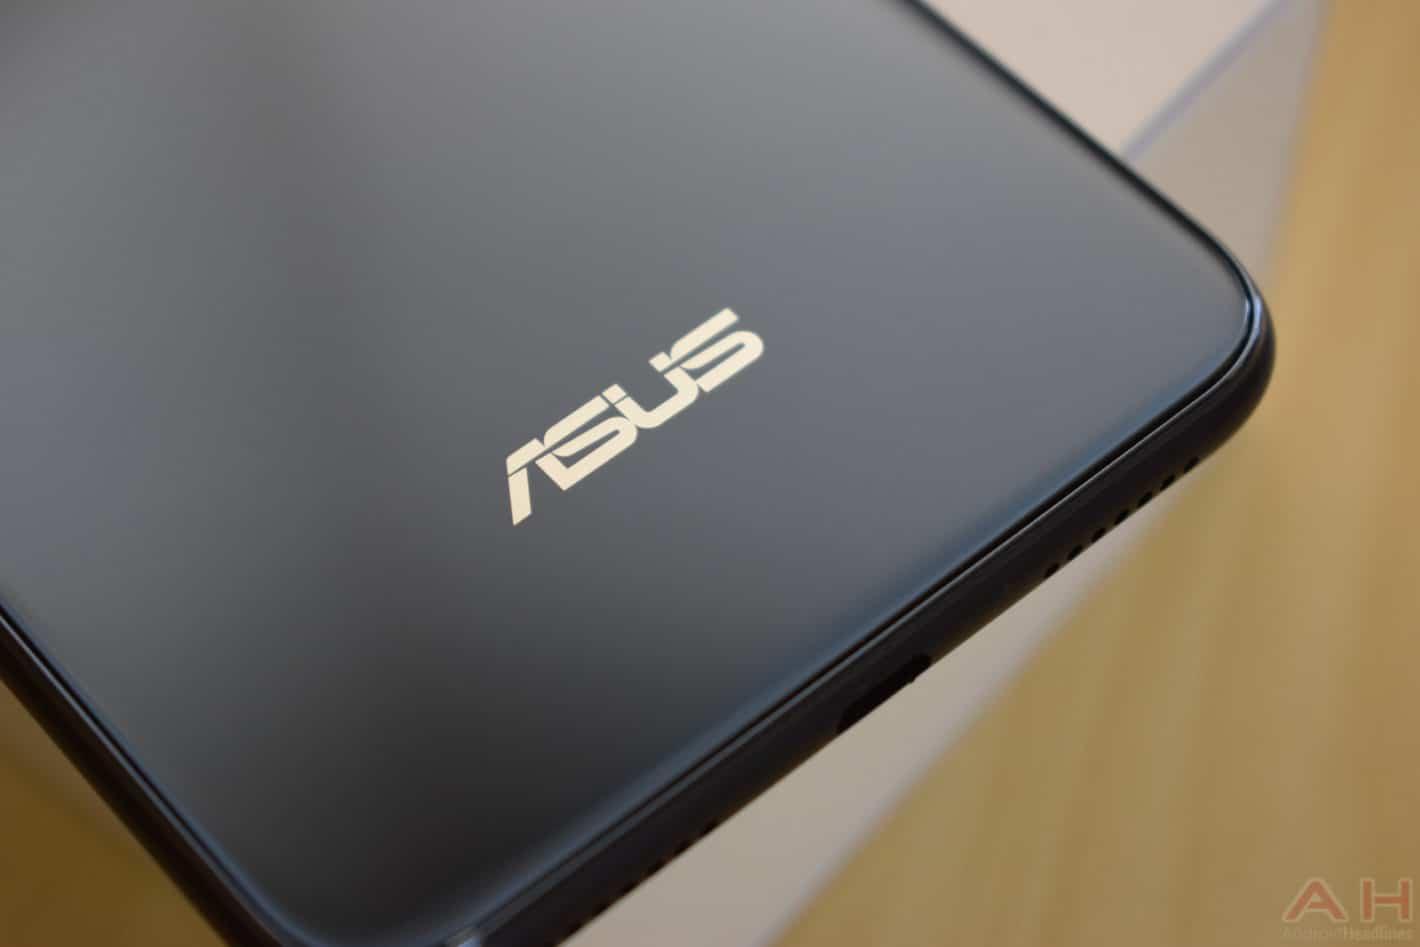 ASUS ZenFone 5Q AM AH 7